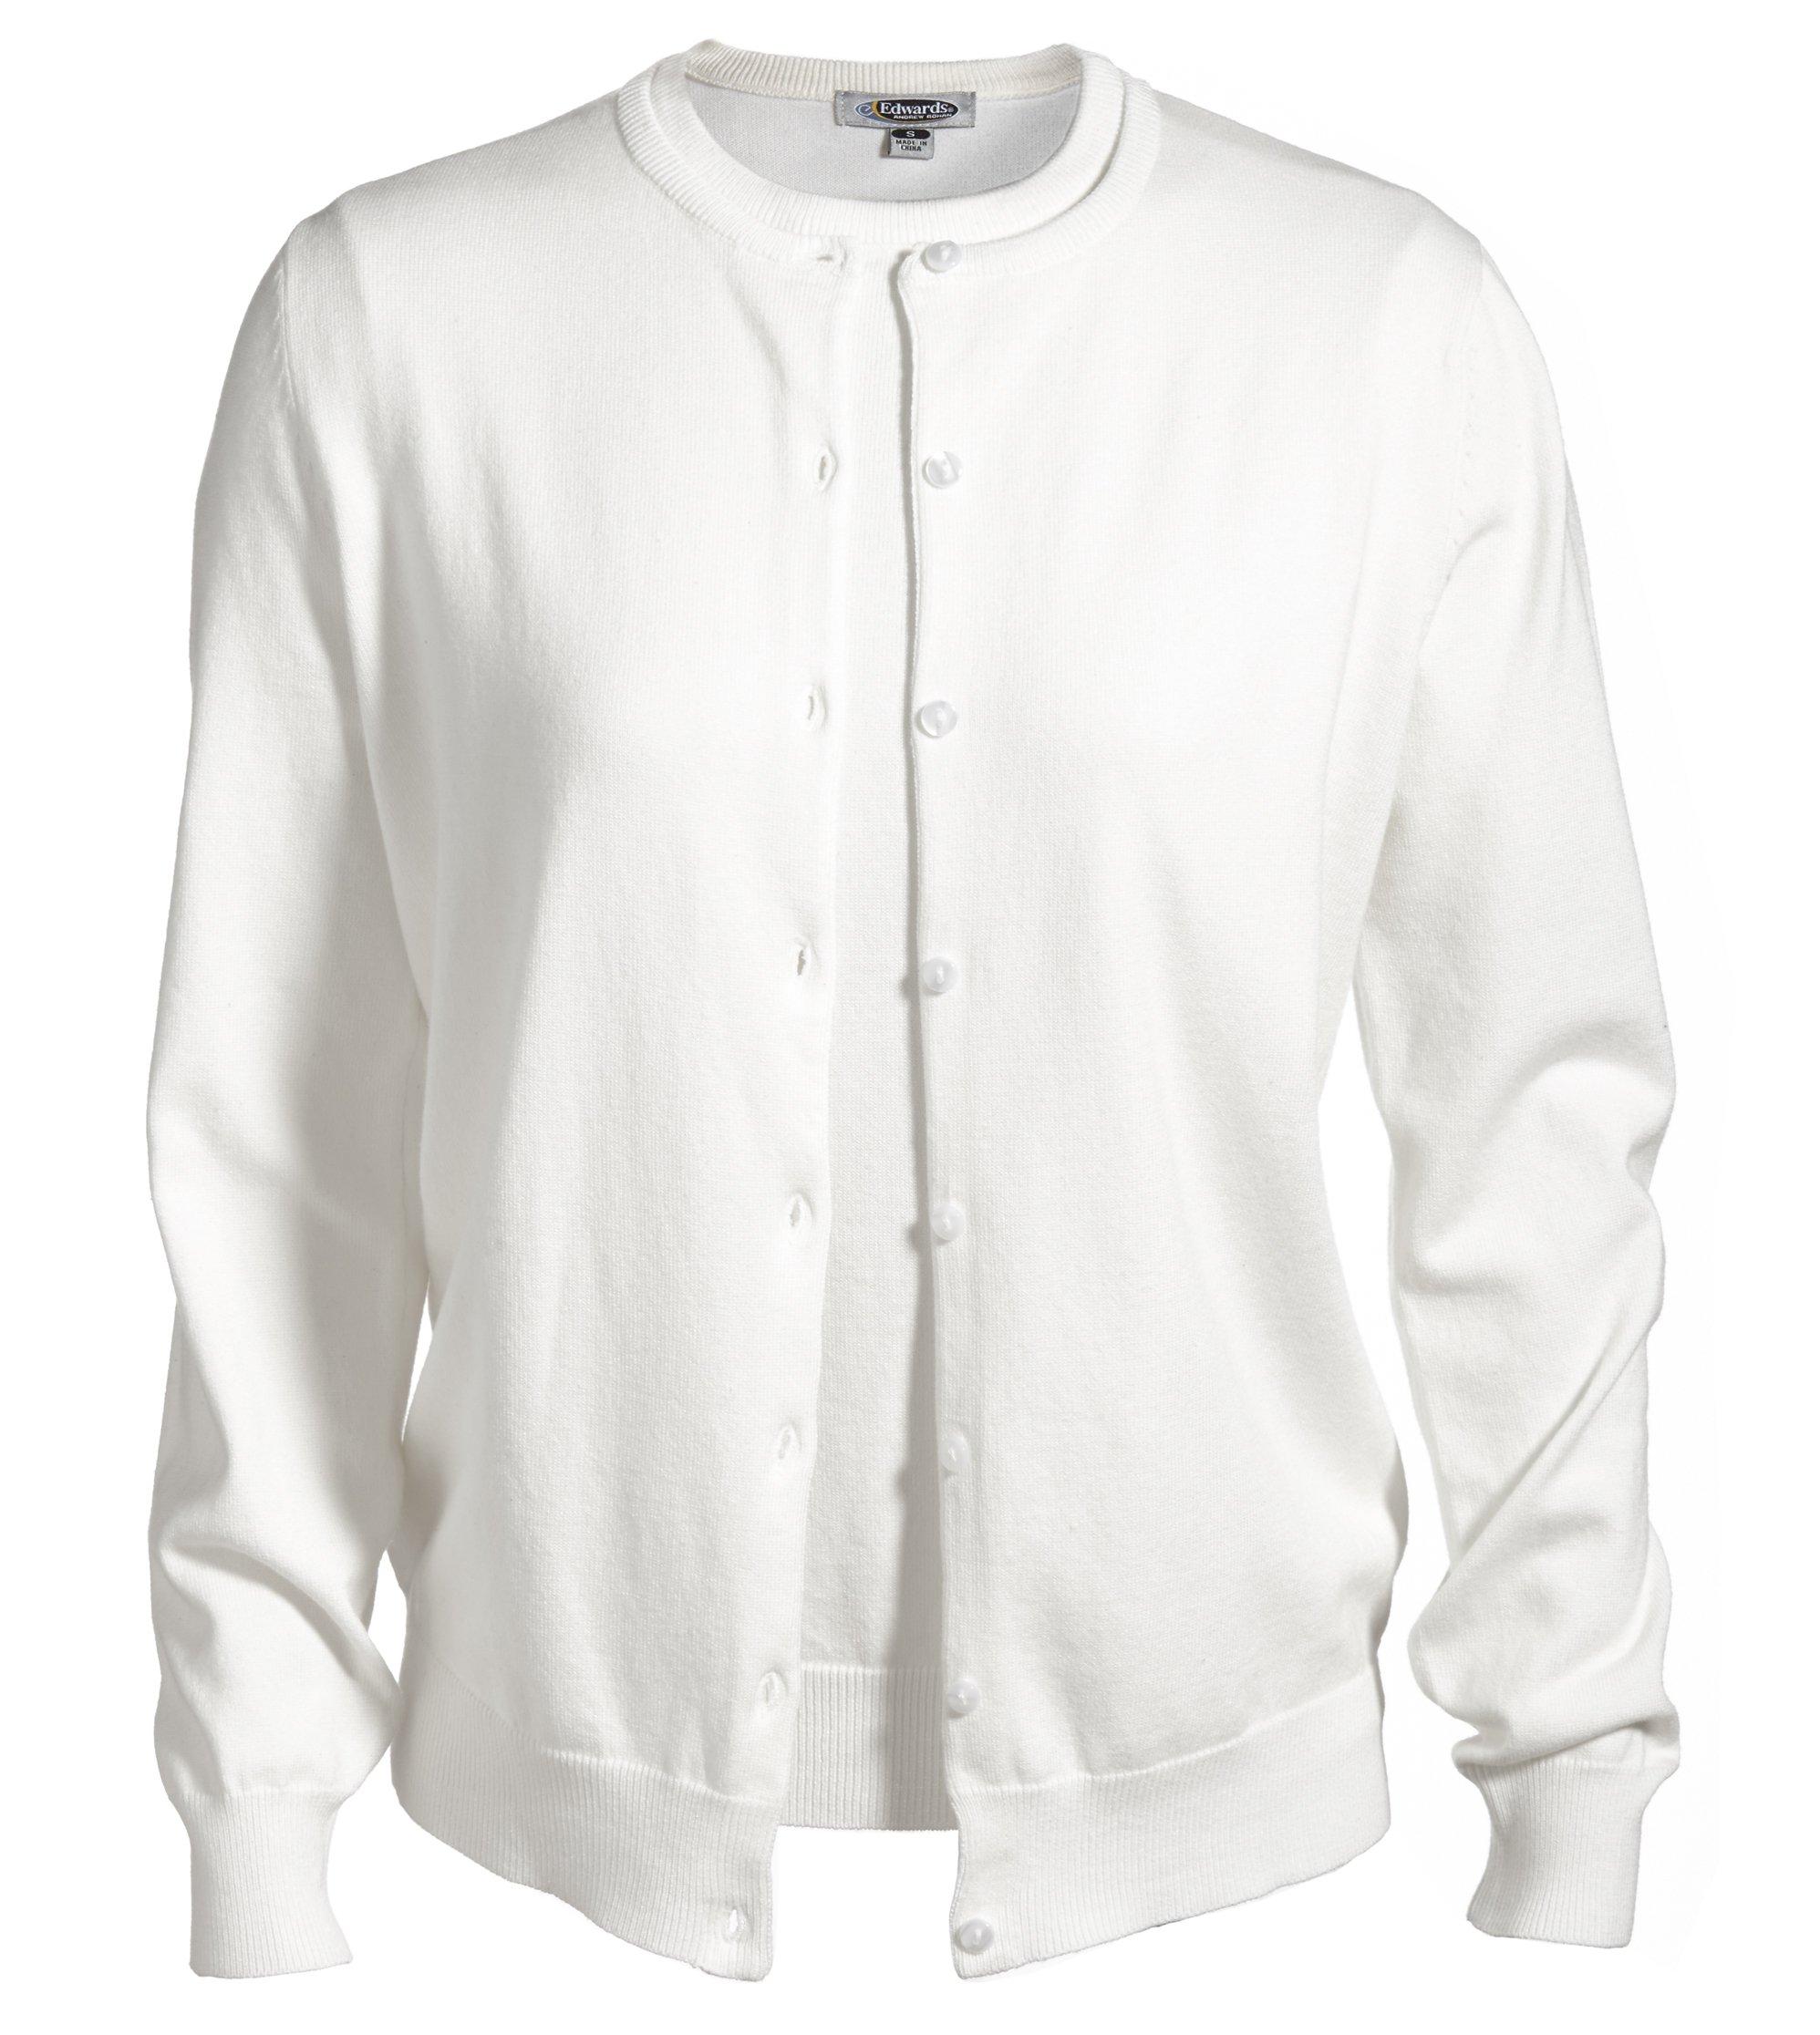 Averill's Sharper Uniforms Women's Ladies Fine Gauge Twin Sweater Set Medium White by Averill's Sharper Uniforms (Image #1)